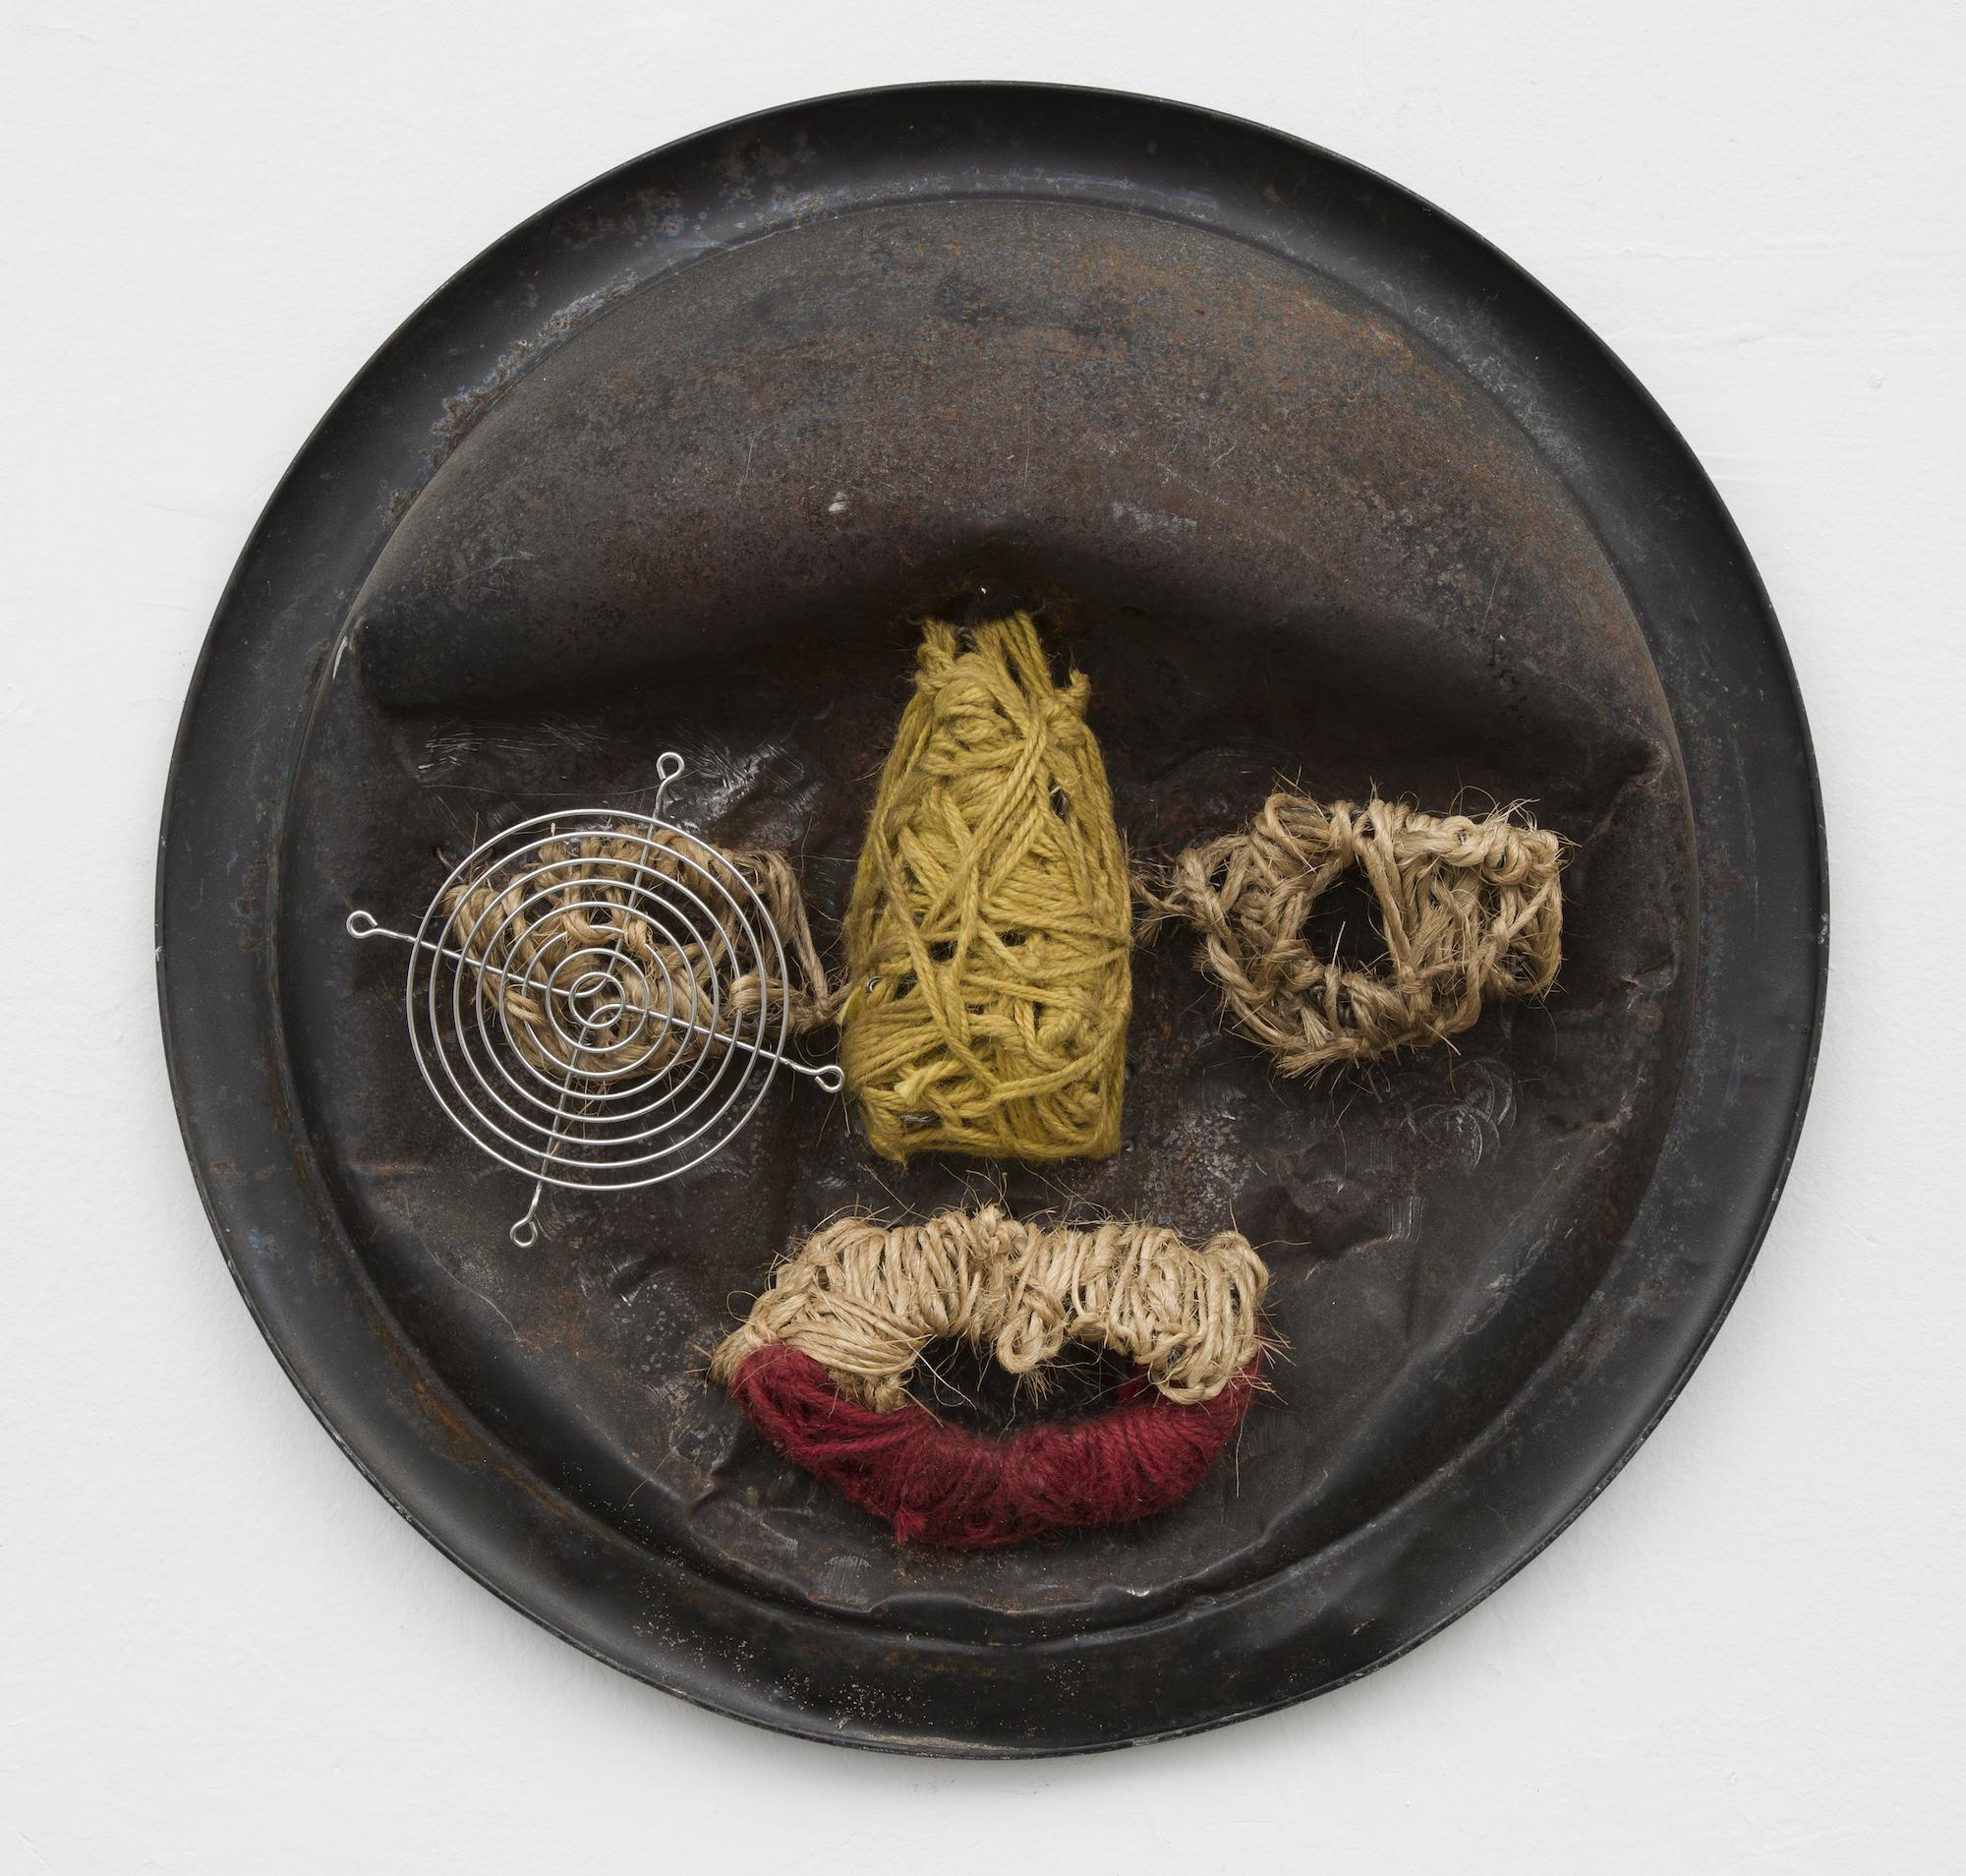 Sangalyambogo, (Favorite Daughter of The King of Buganda), 2016, Metal, twine, yarn and found objects, 20 (diameter) x 3 in, courtesy Gordon Robichaux.jpg